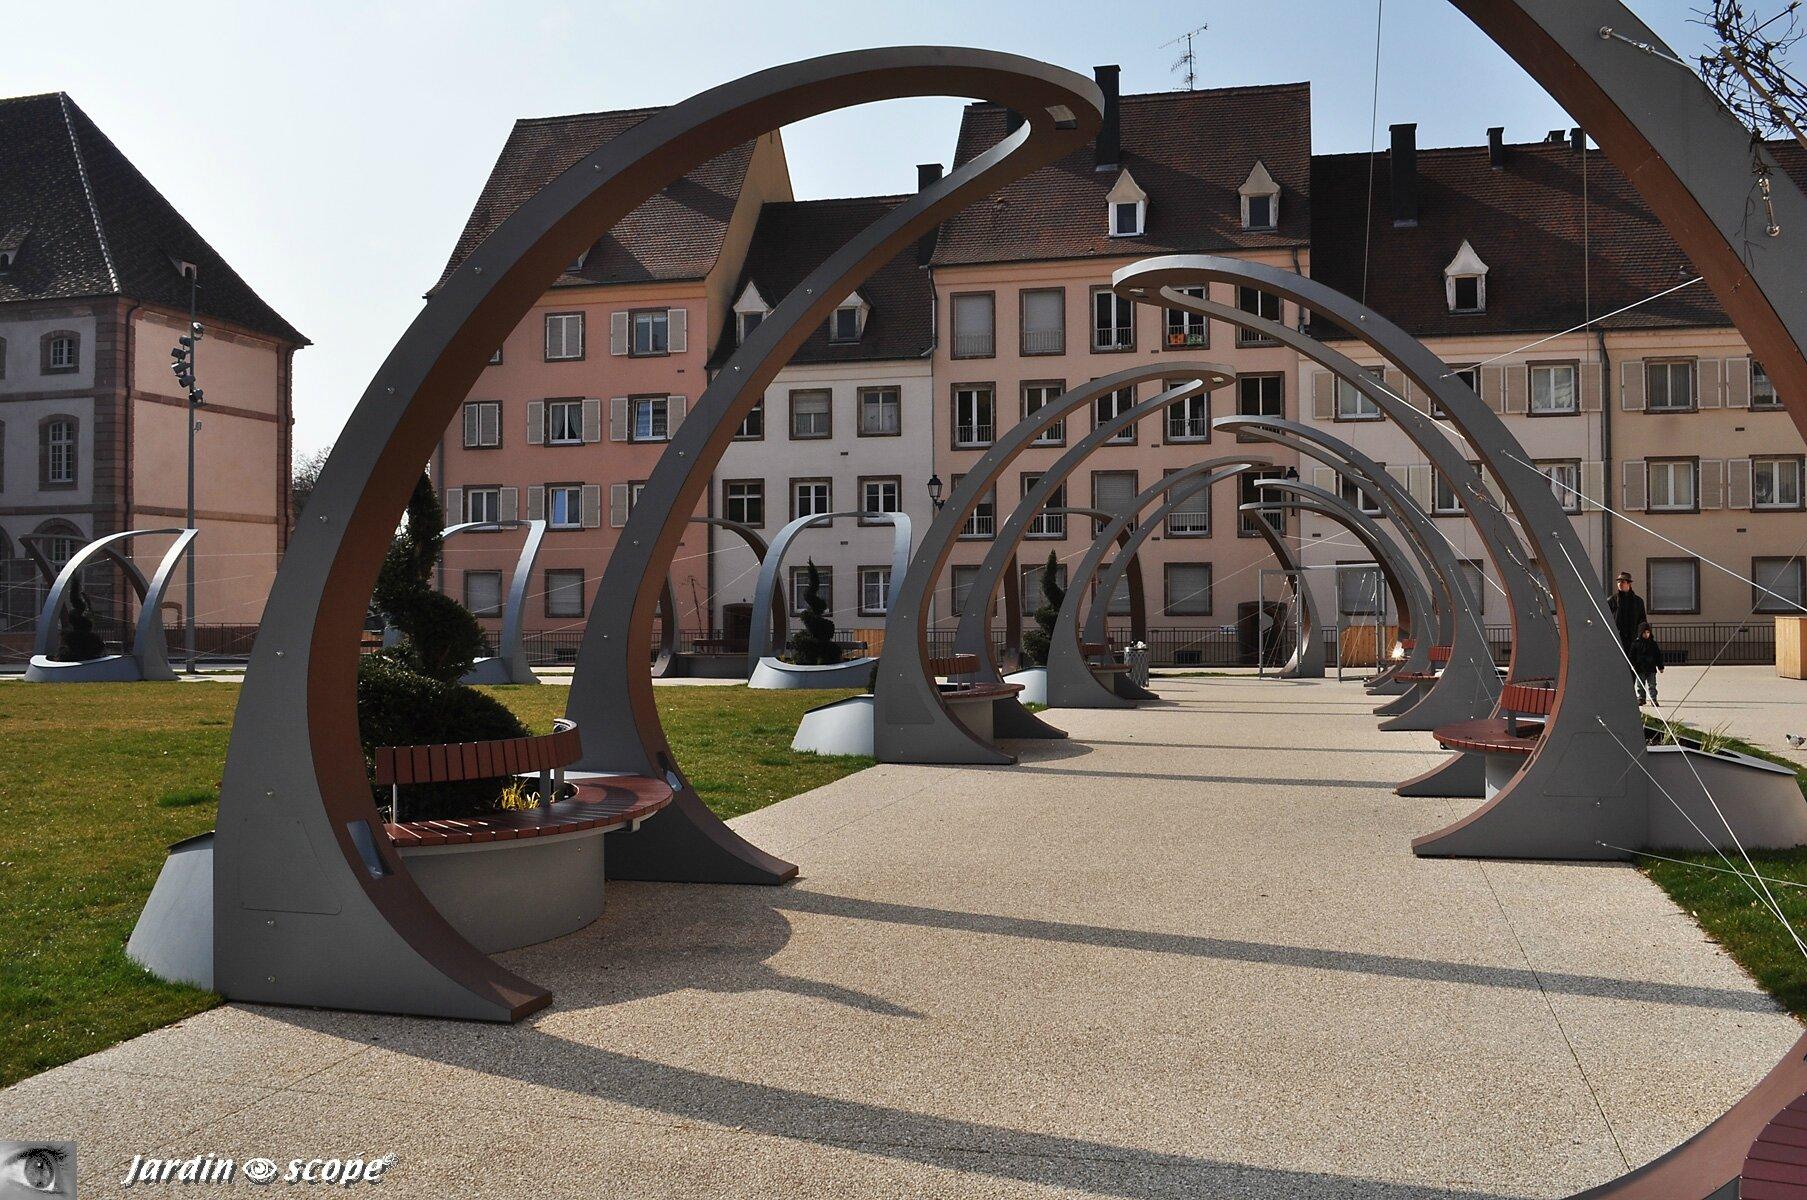 Banc ultra-modernes Place Ancien hôpital royal à Colmar